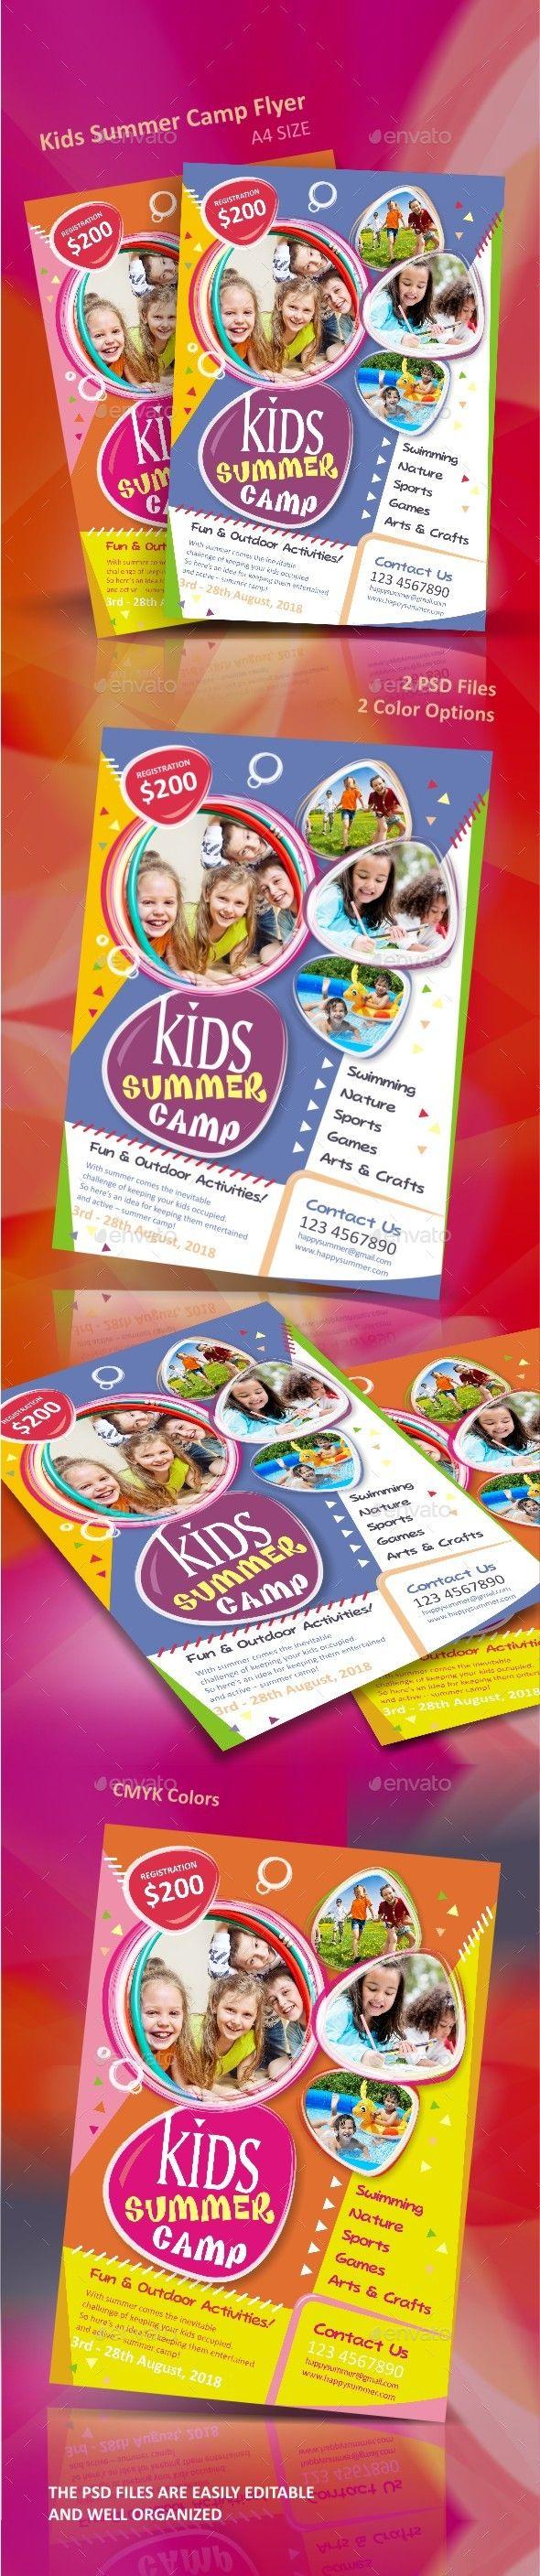 Kids Summer Camp Flyer Template PSD. Download here: http://graphicriver.net/item/kids-summer-camp-flyer/16148297?ref=ksioks